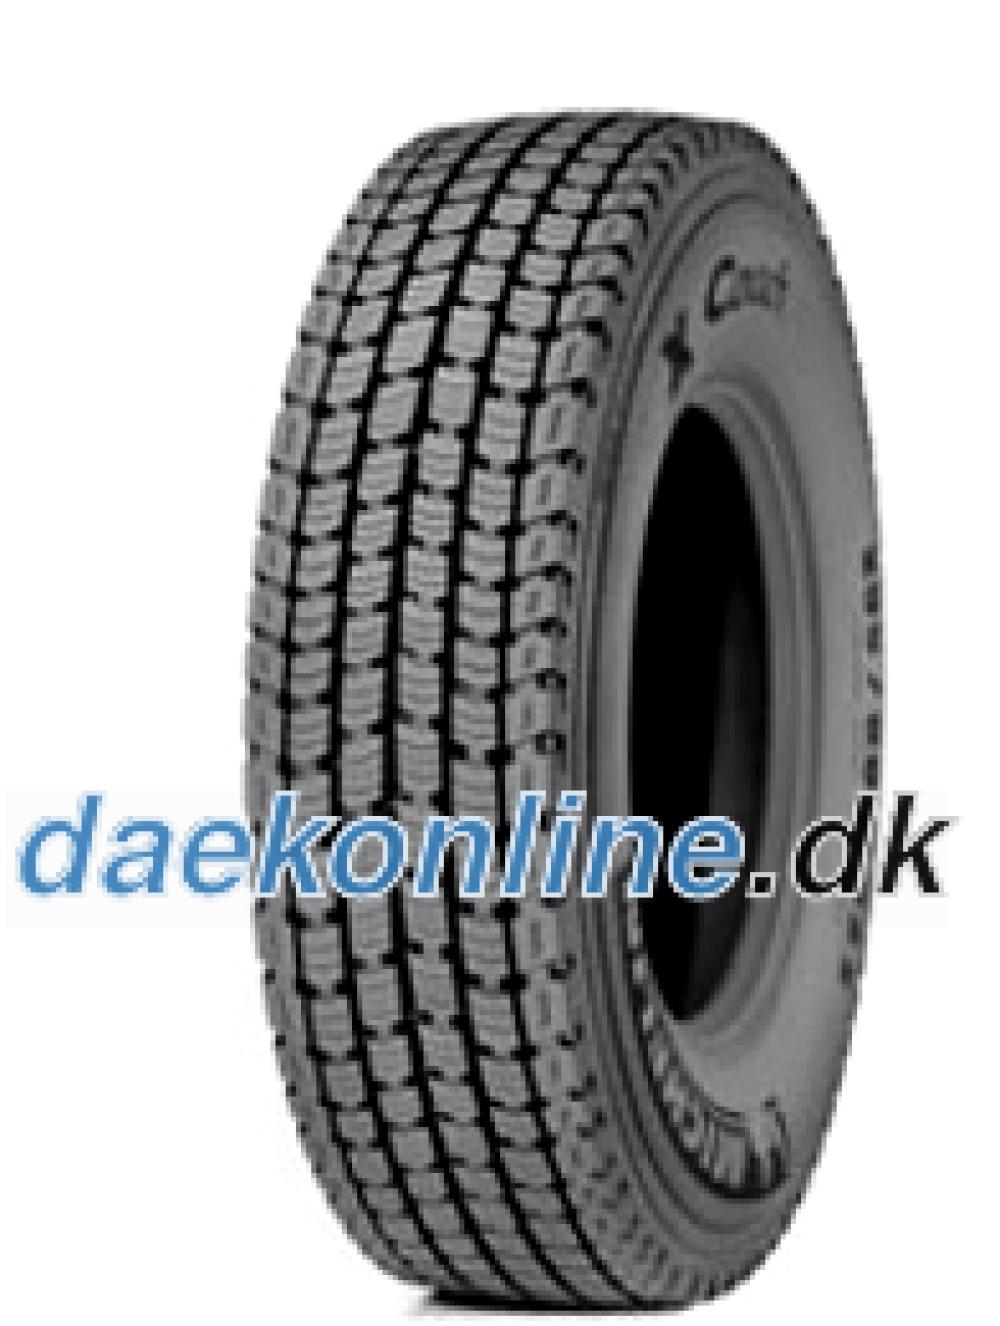 michelin-x-coach-xd-29580-r225-152148m-dobbelt-markning-154l